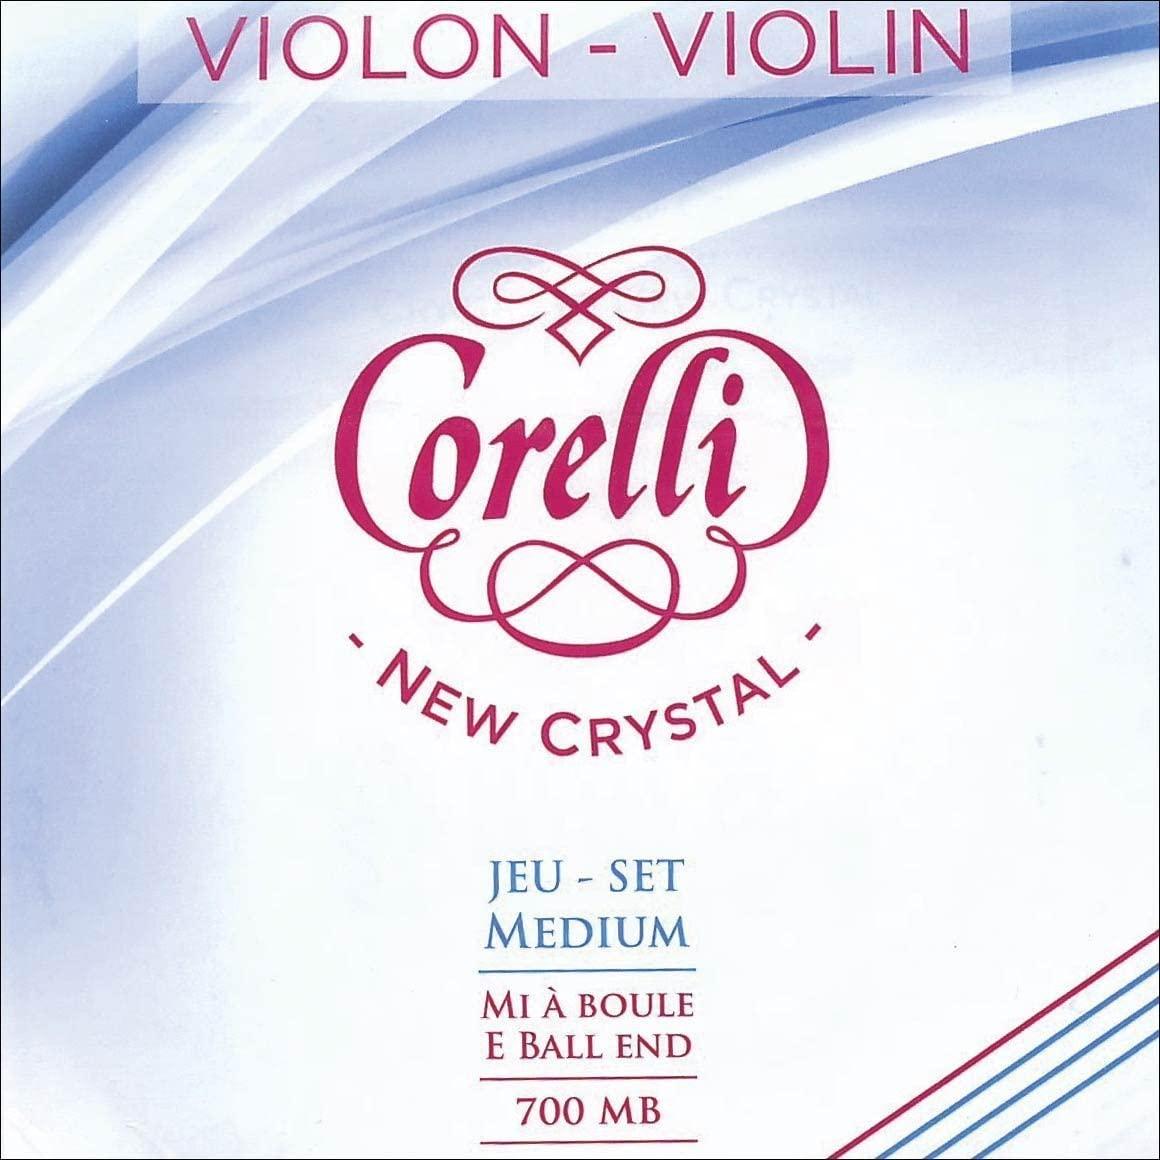 Corelli Crystal 4/4 Violin Set - Medium Gauge with Ball End E